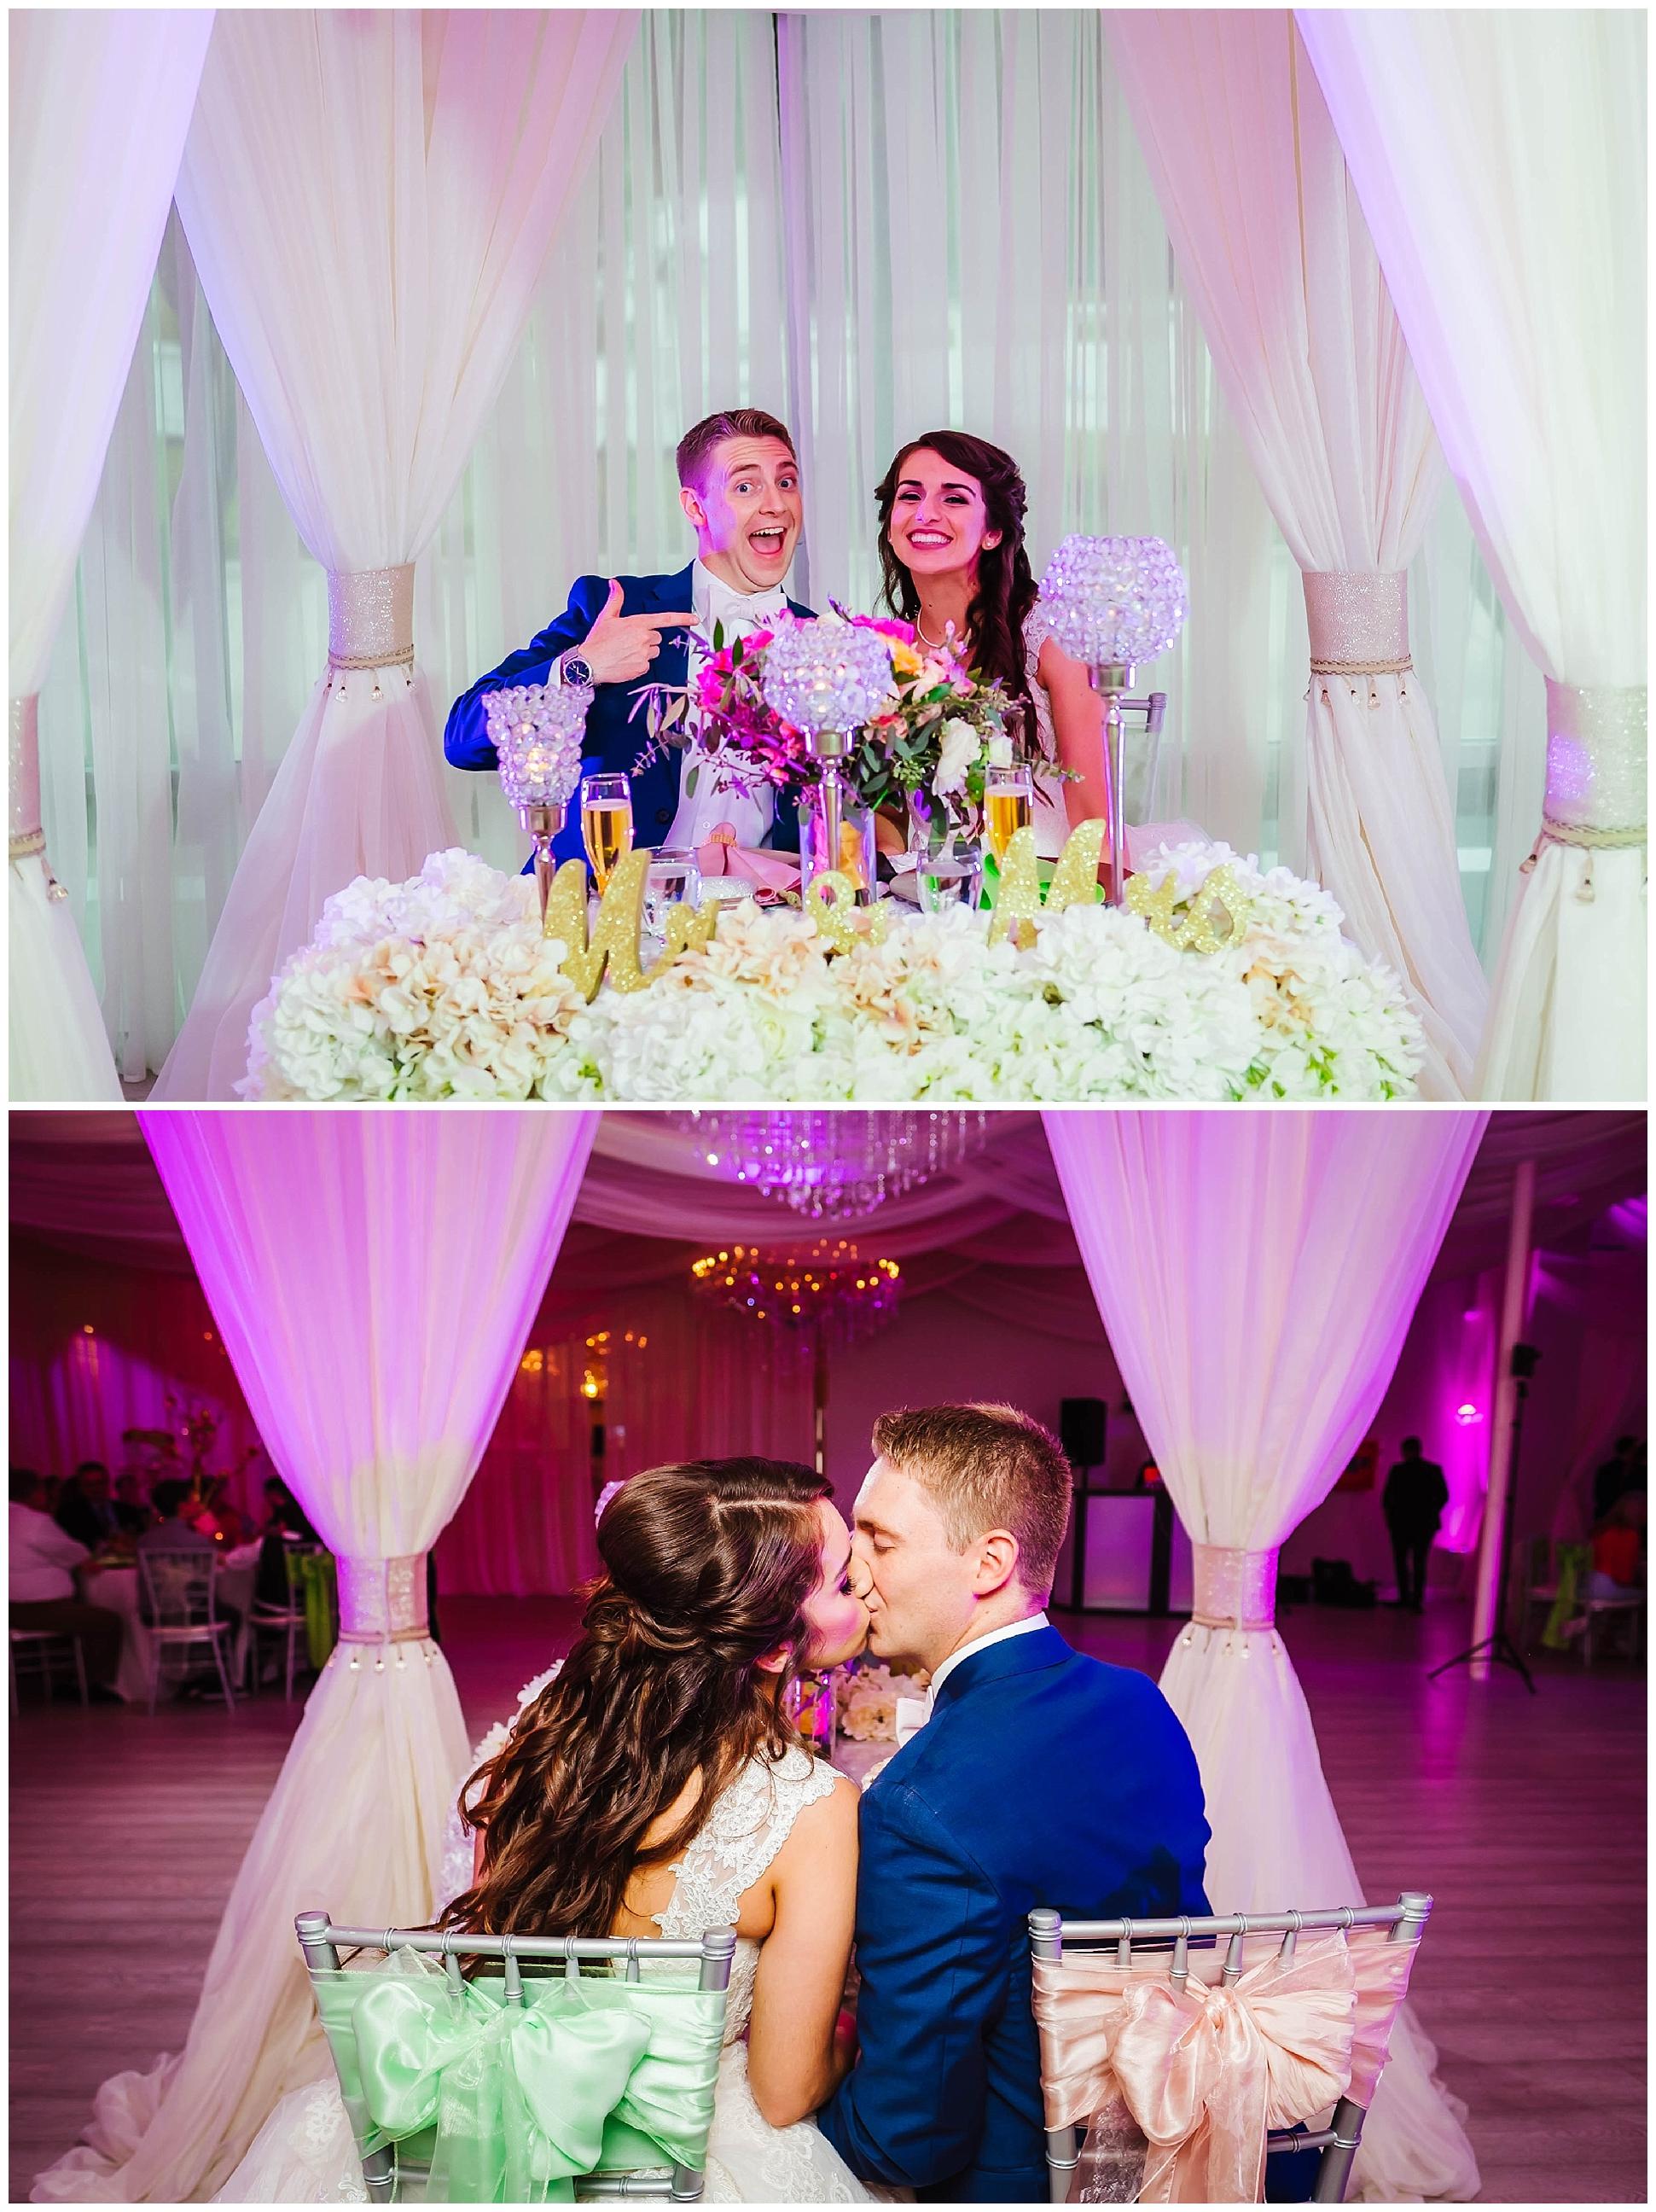 st-pete-wedding-photographer-sunken-gardens-crystal-ballroom-princess-dancer_0190.jpg